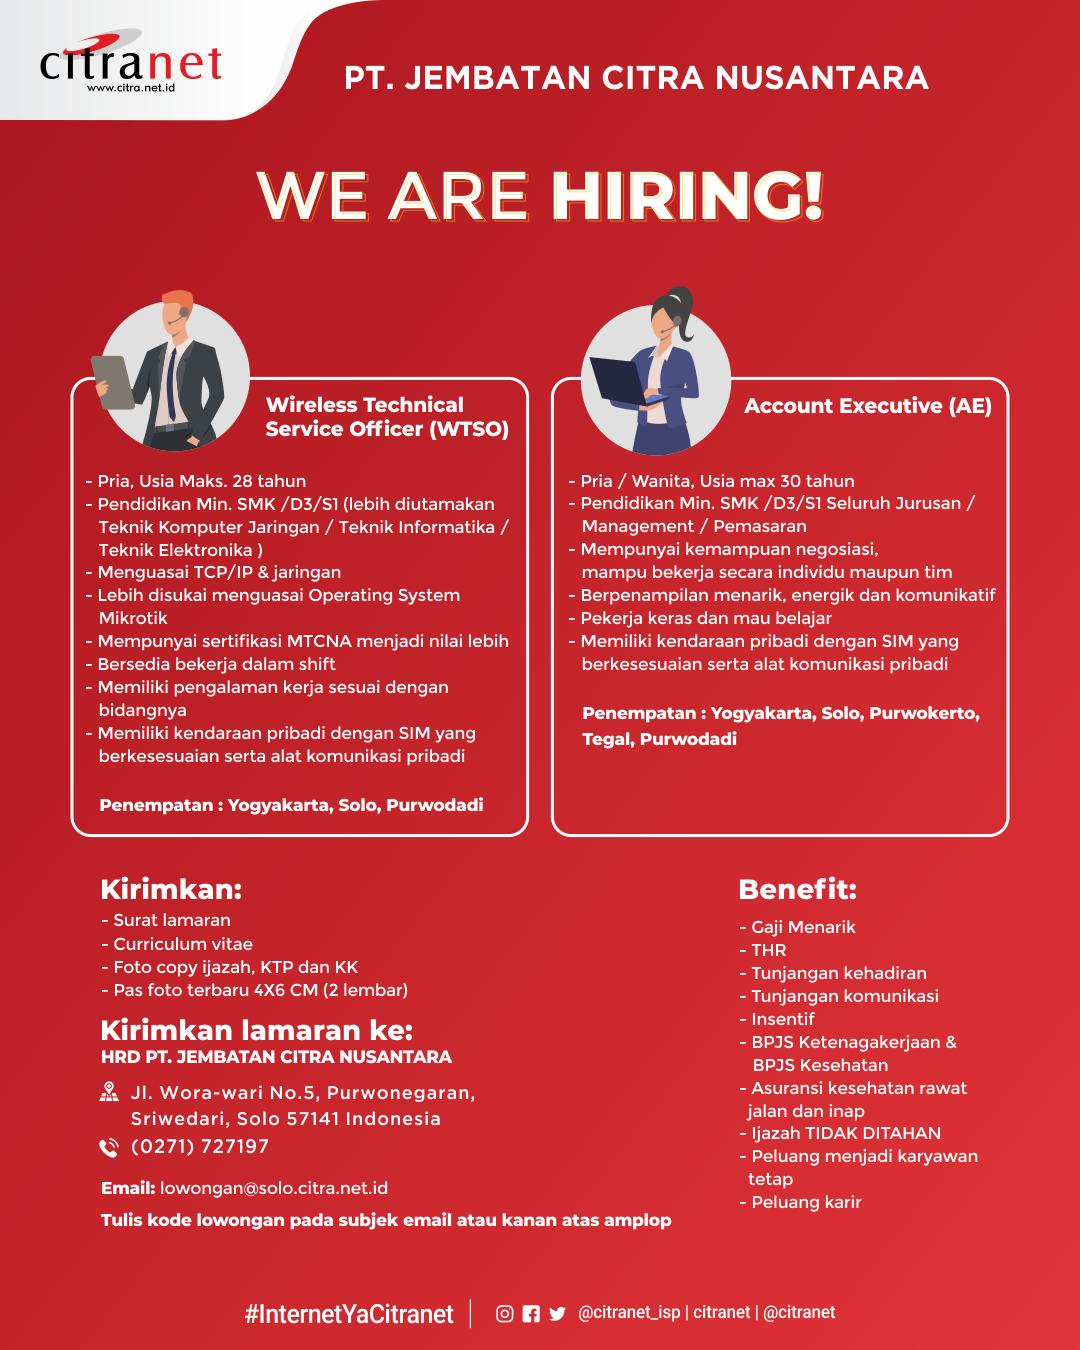 Lowongan Kerja Citranet Posisi Wireless Technical Service Officer Dan Account Executive Loker Swasta